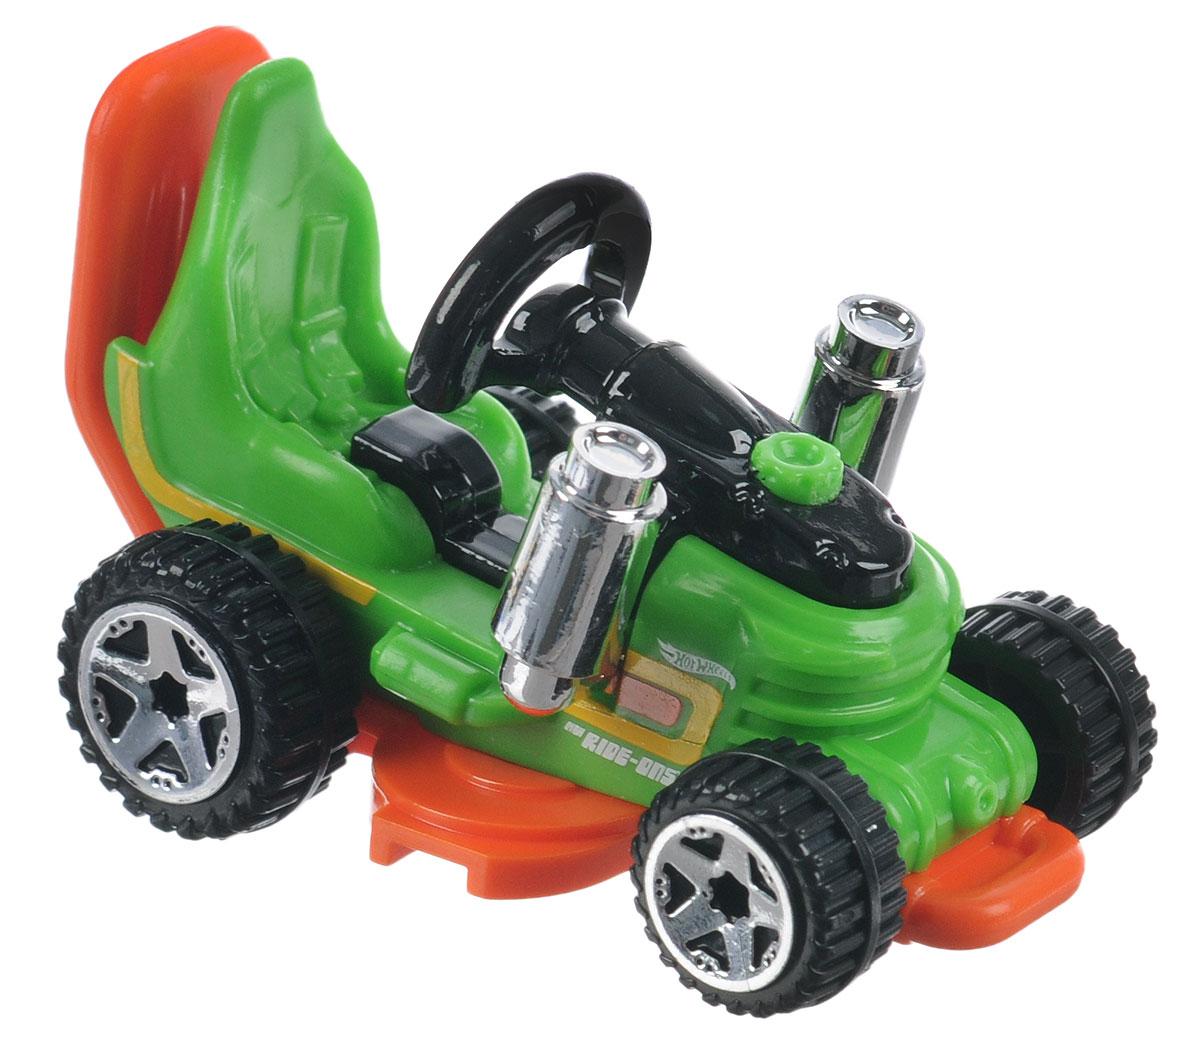 Hot Wheels Машинка Grass Chomper